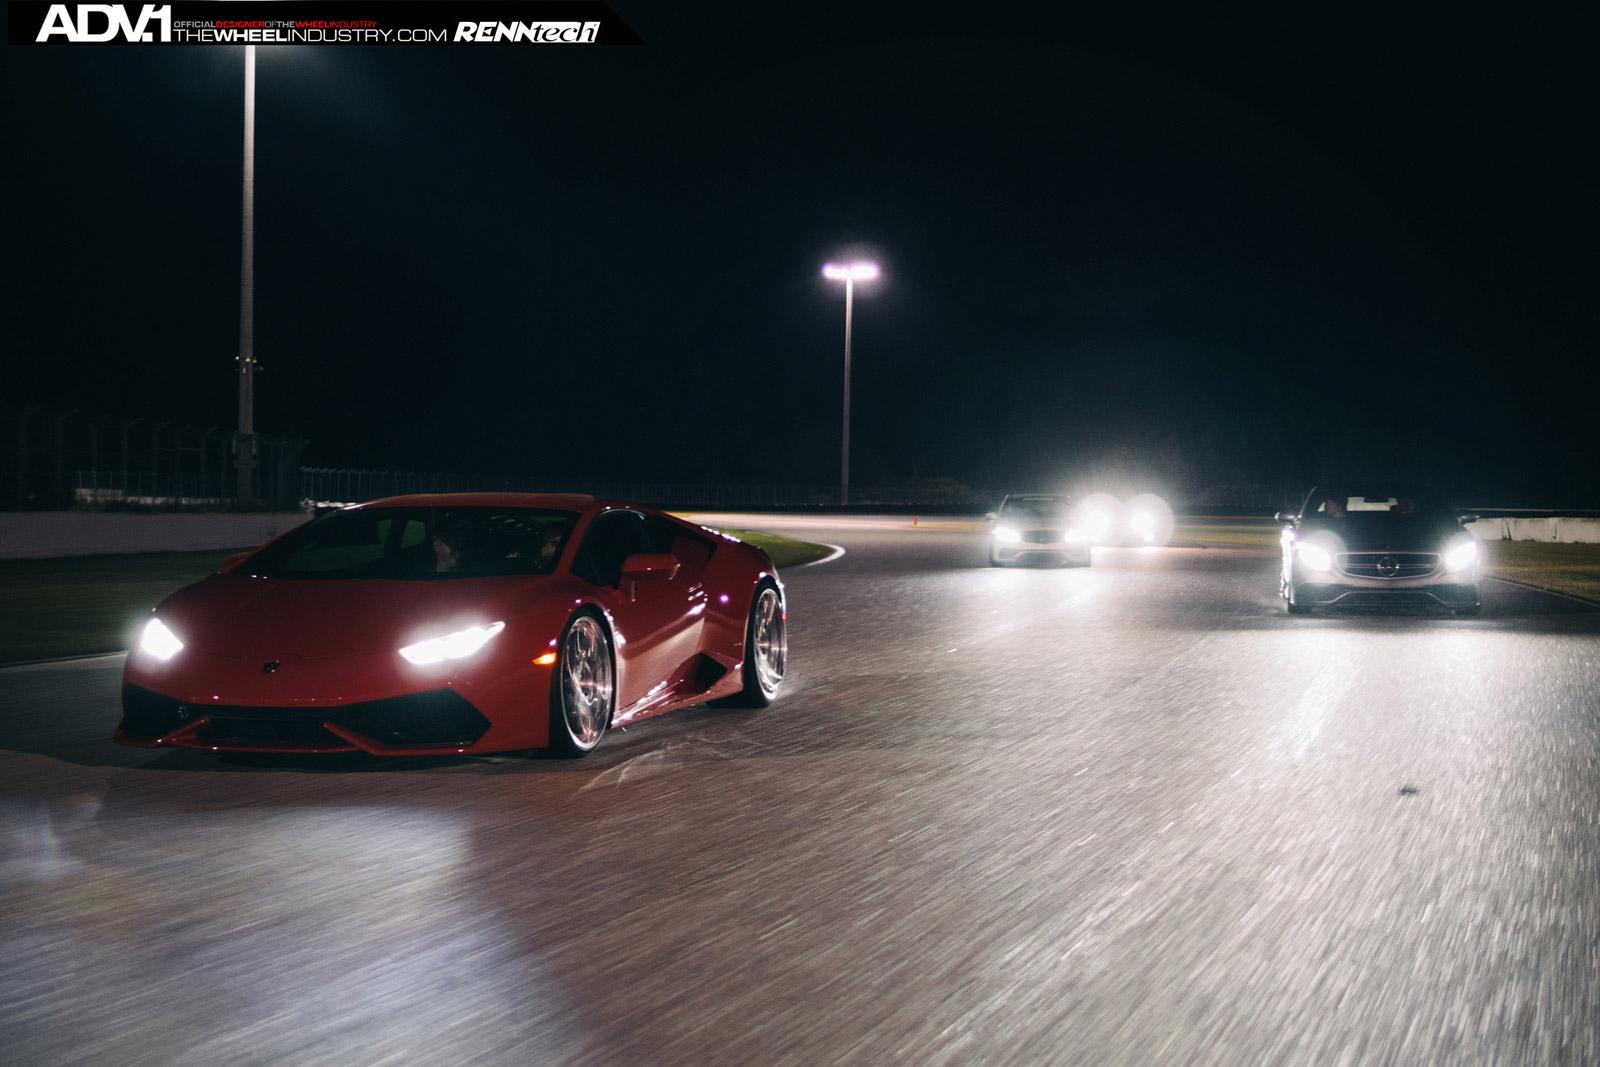 ADV 1 Lamborghini Huracan, Porsche 911 and S63 AMG on Track